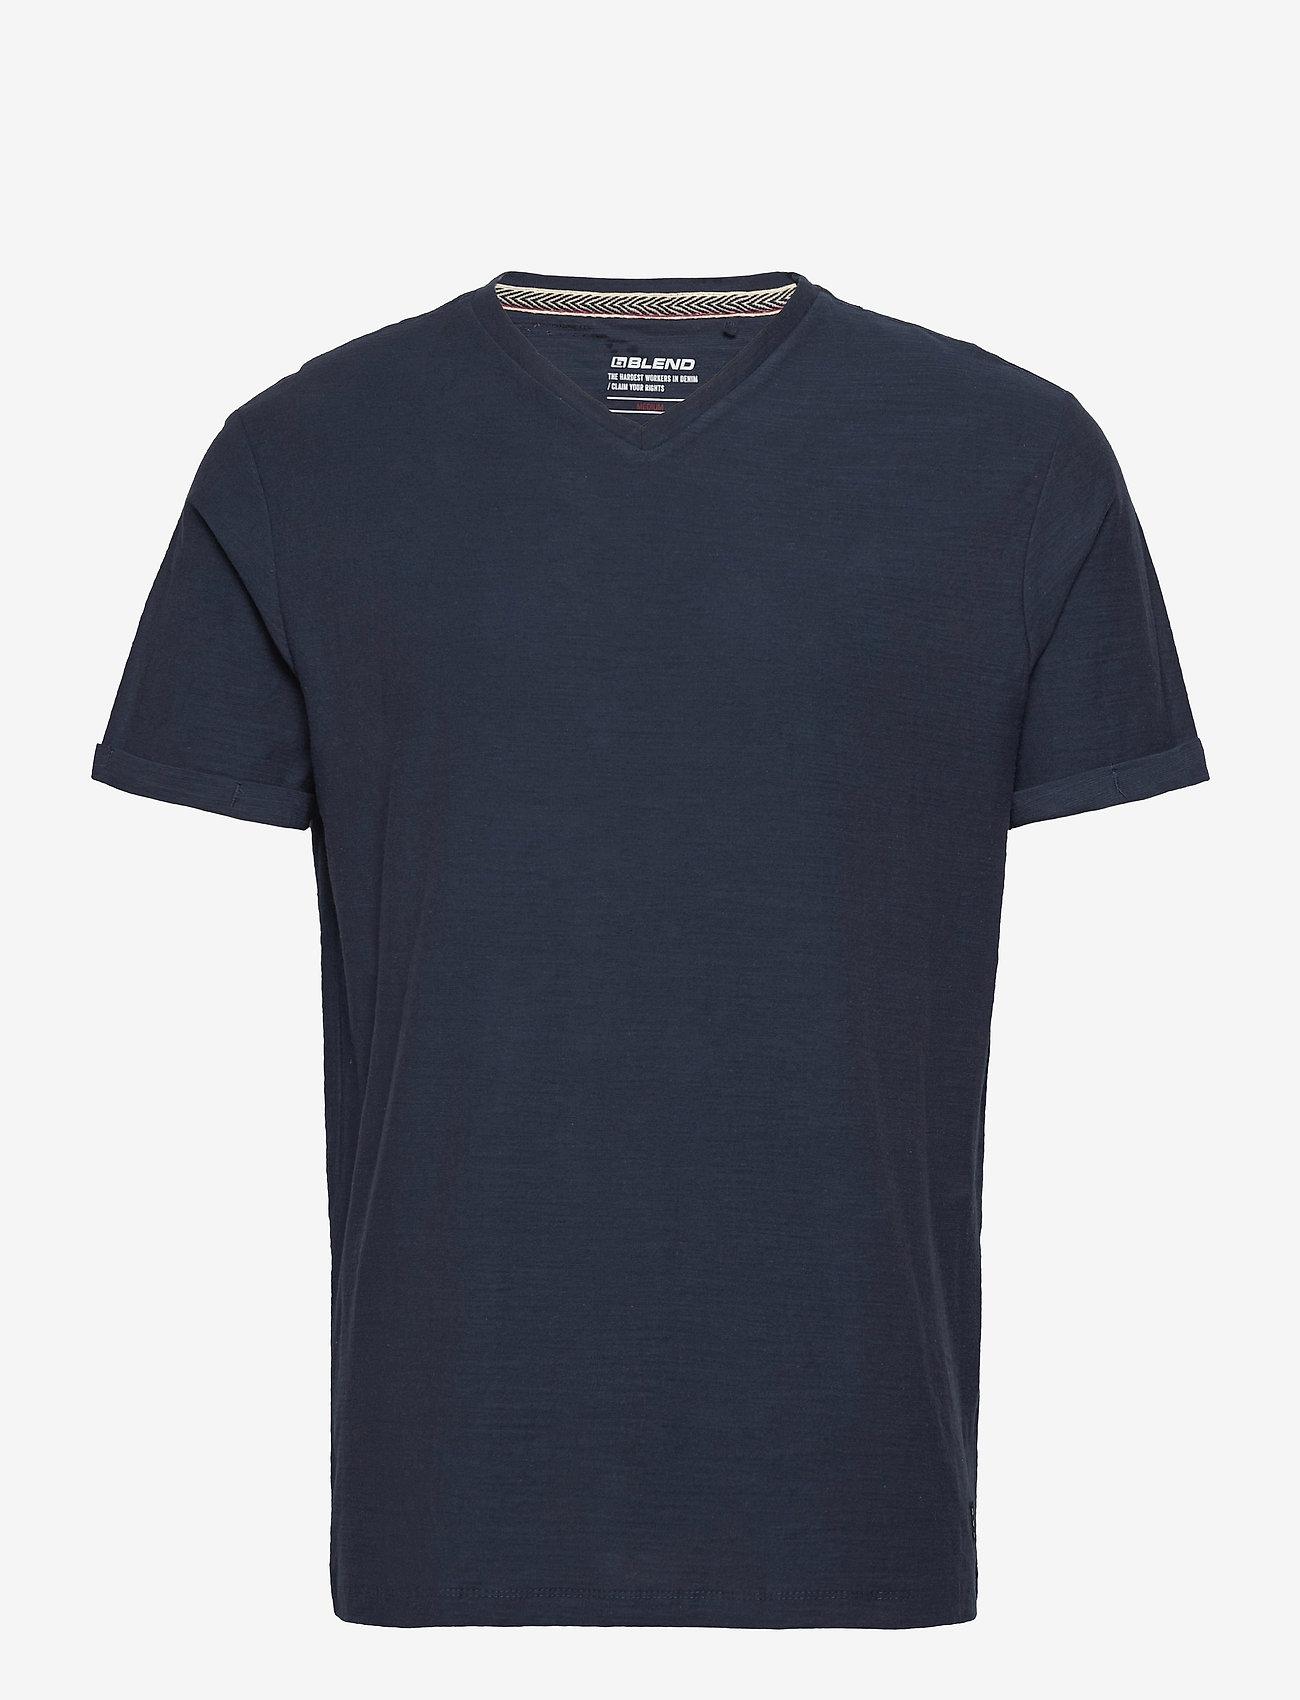 Blend - Tee - basic t-shirts - dress blues - 0